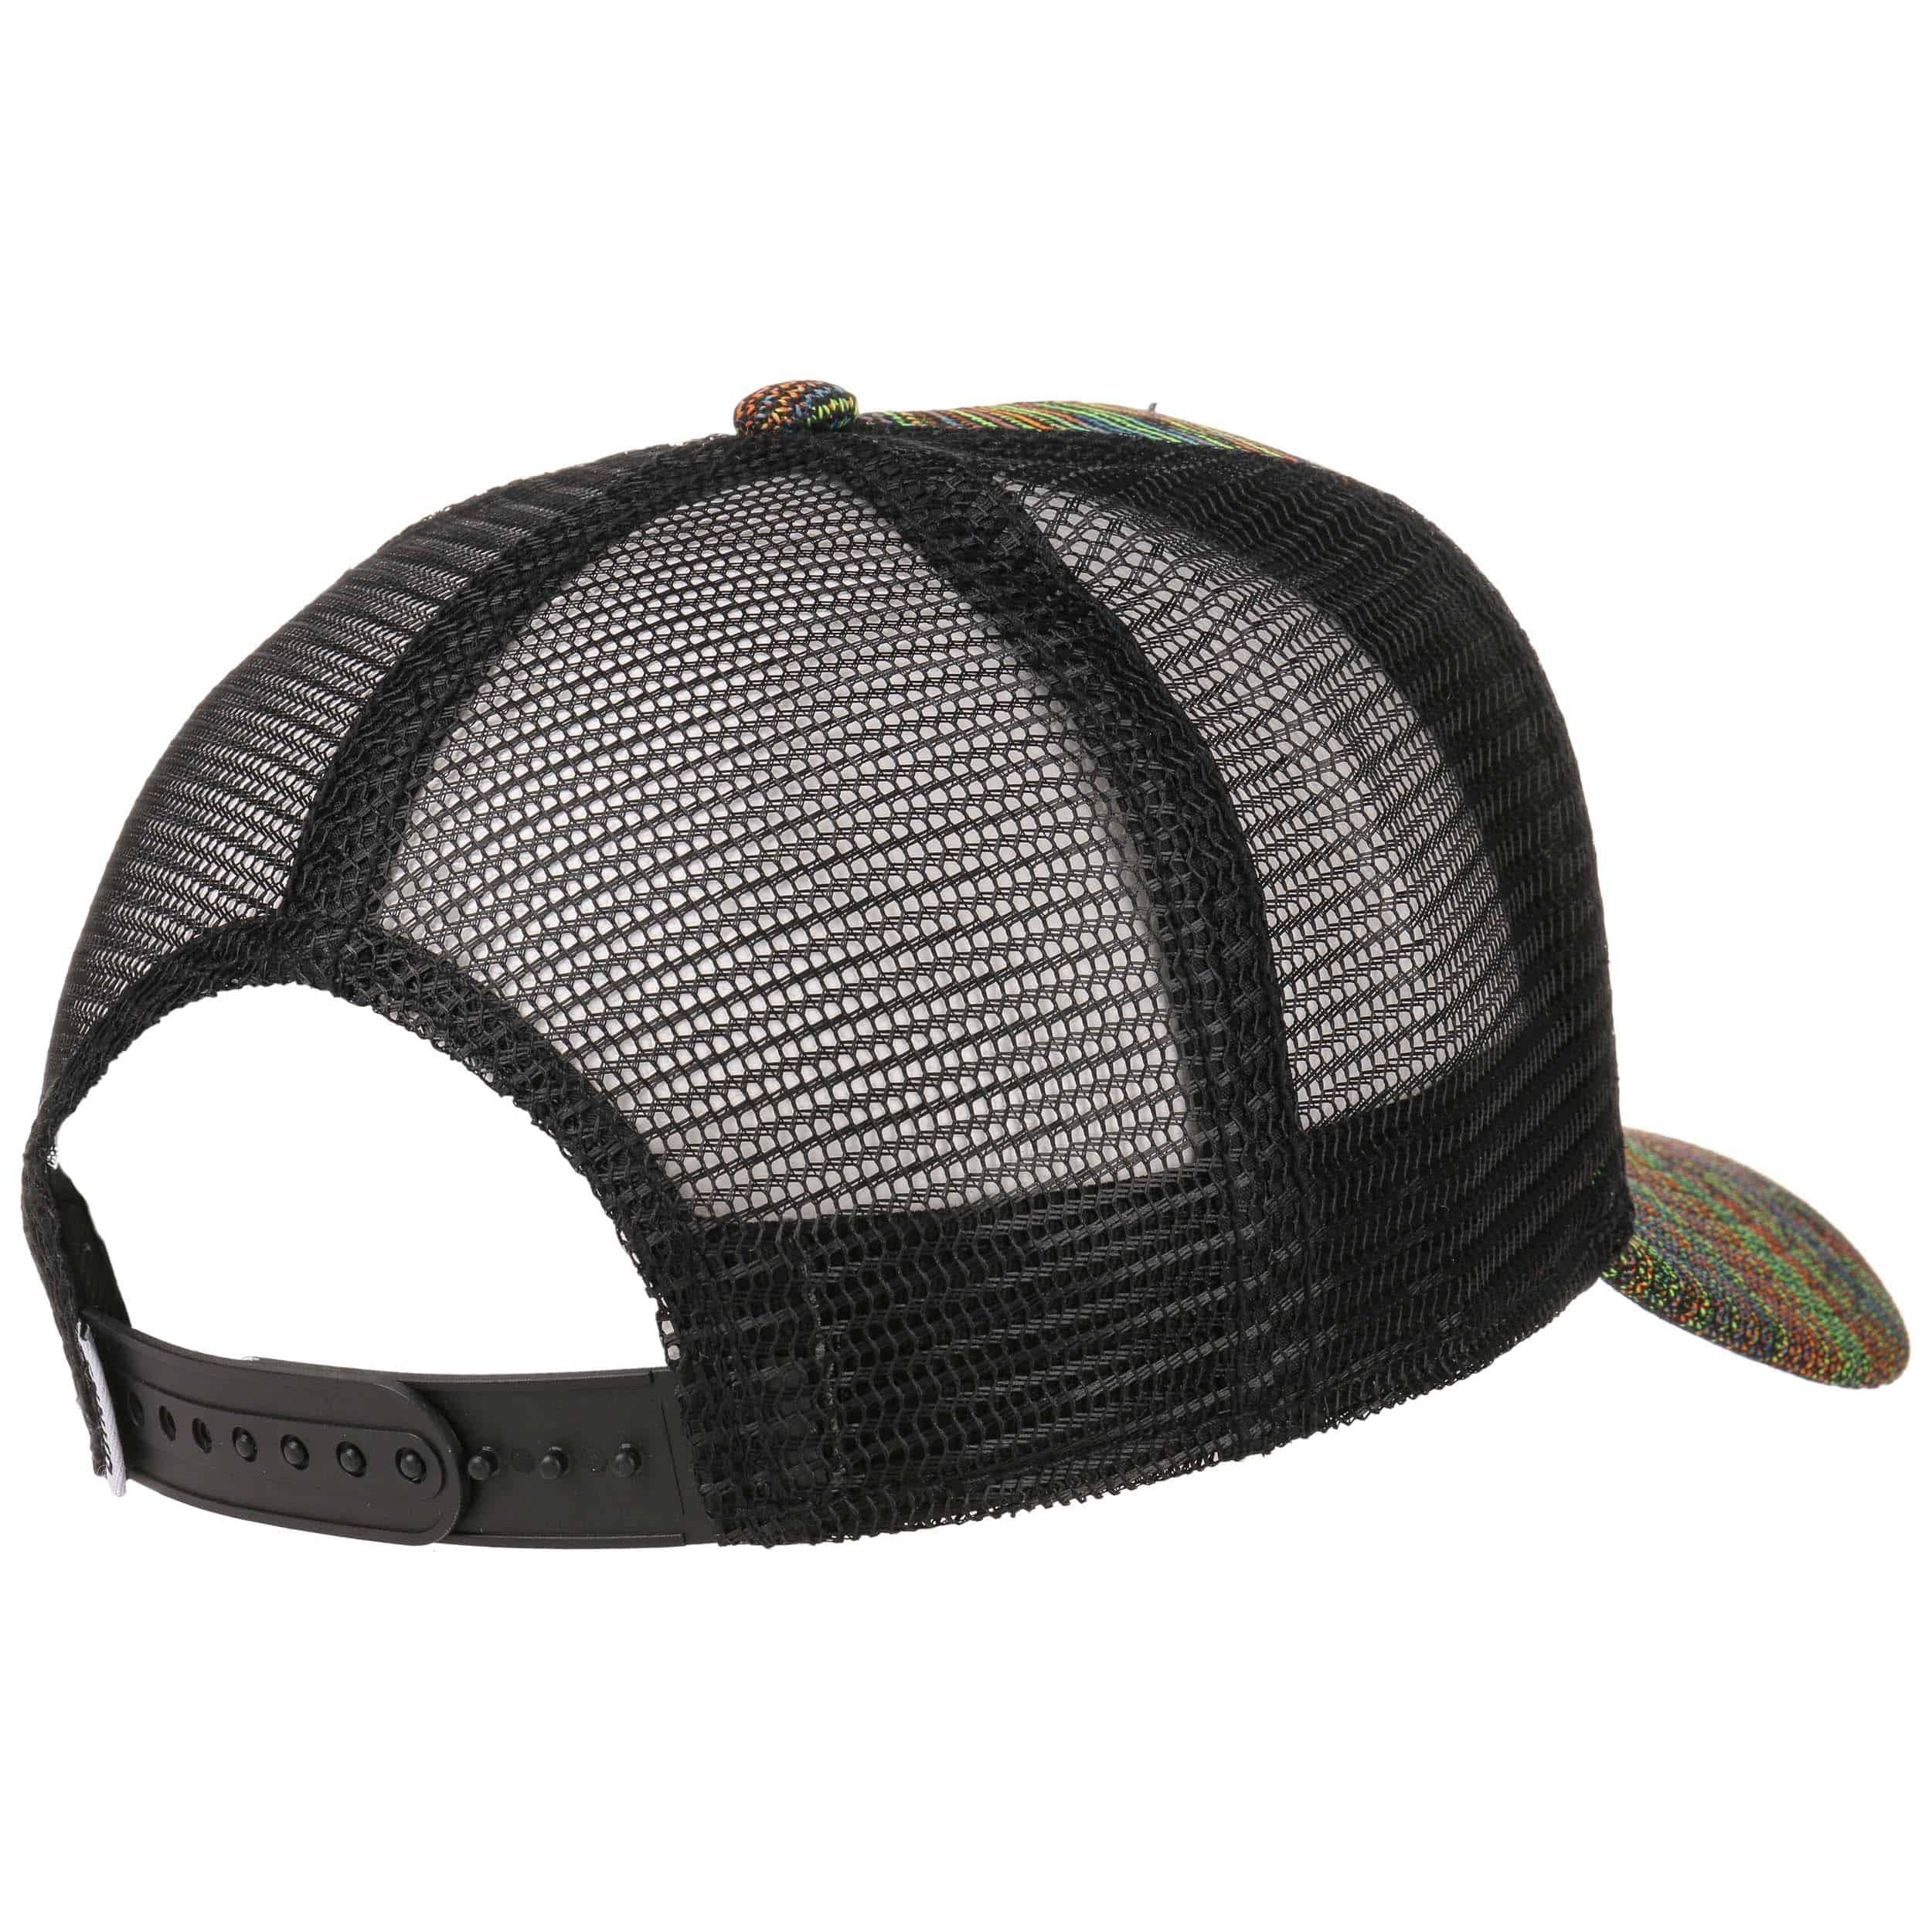 rainbow mesh hft trucker cap by djinns gbp 22 95 hats. Black Bedroom Furniture Sets. Home Design Ideas